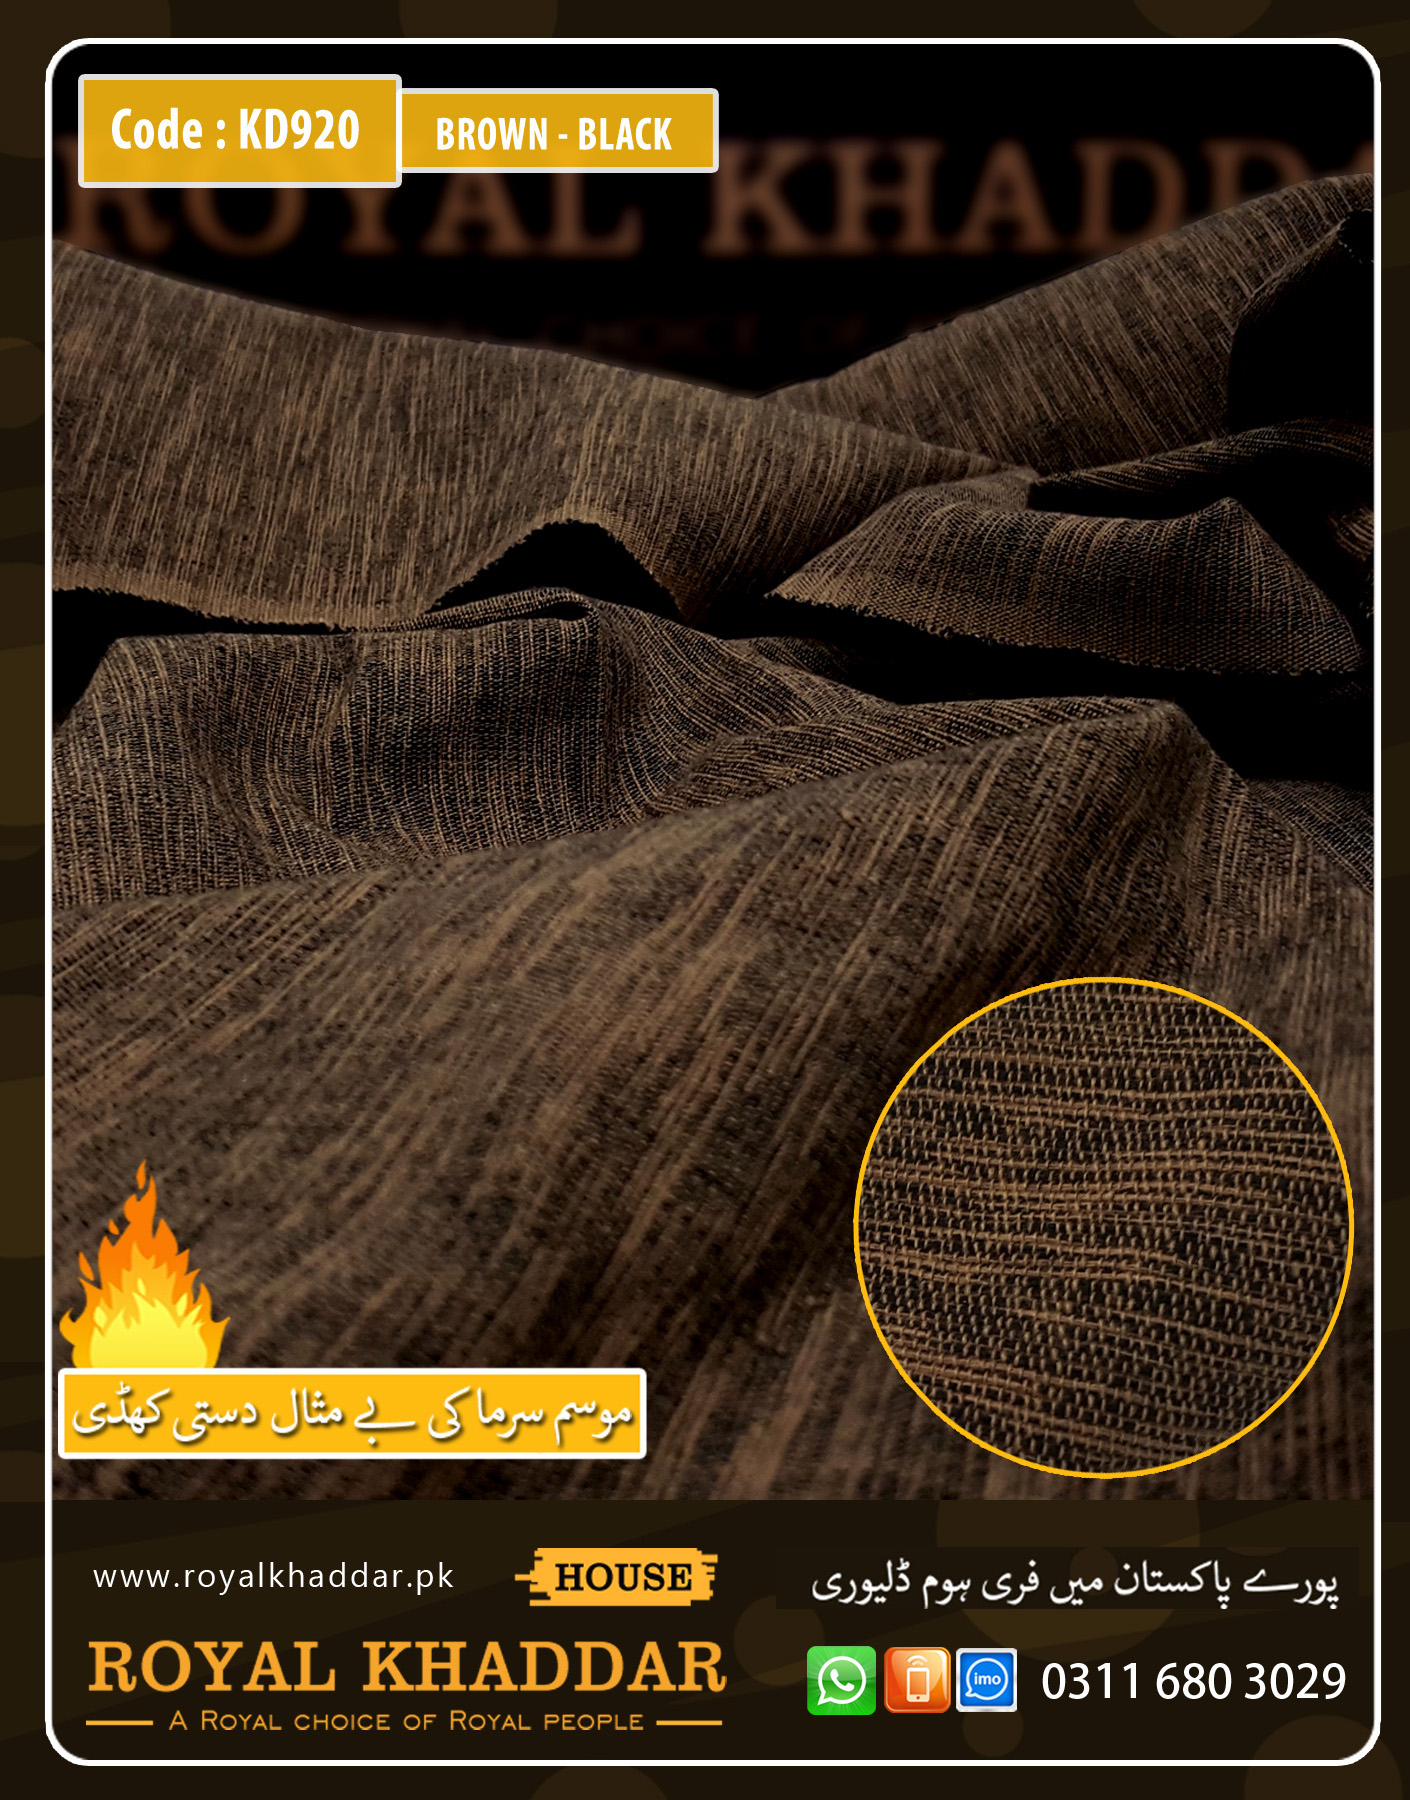 KD920 Brown - Black Handmade Khaddi